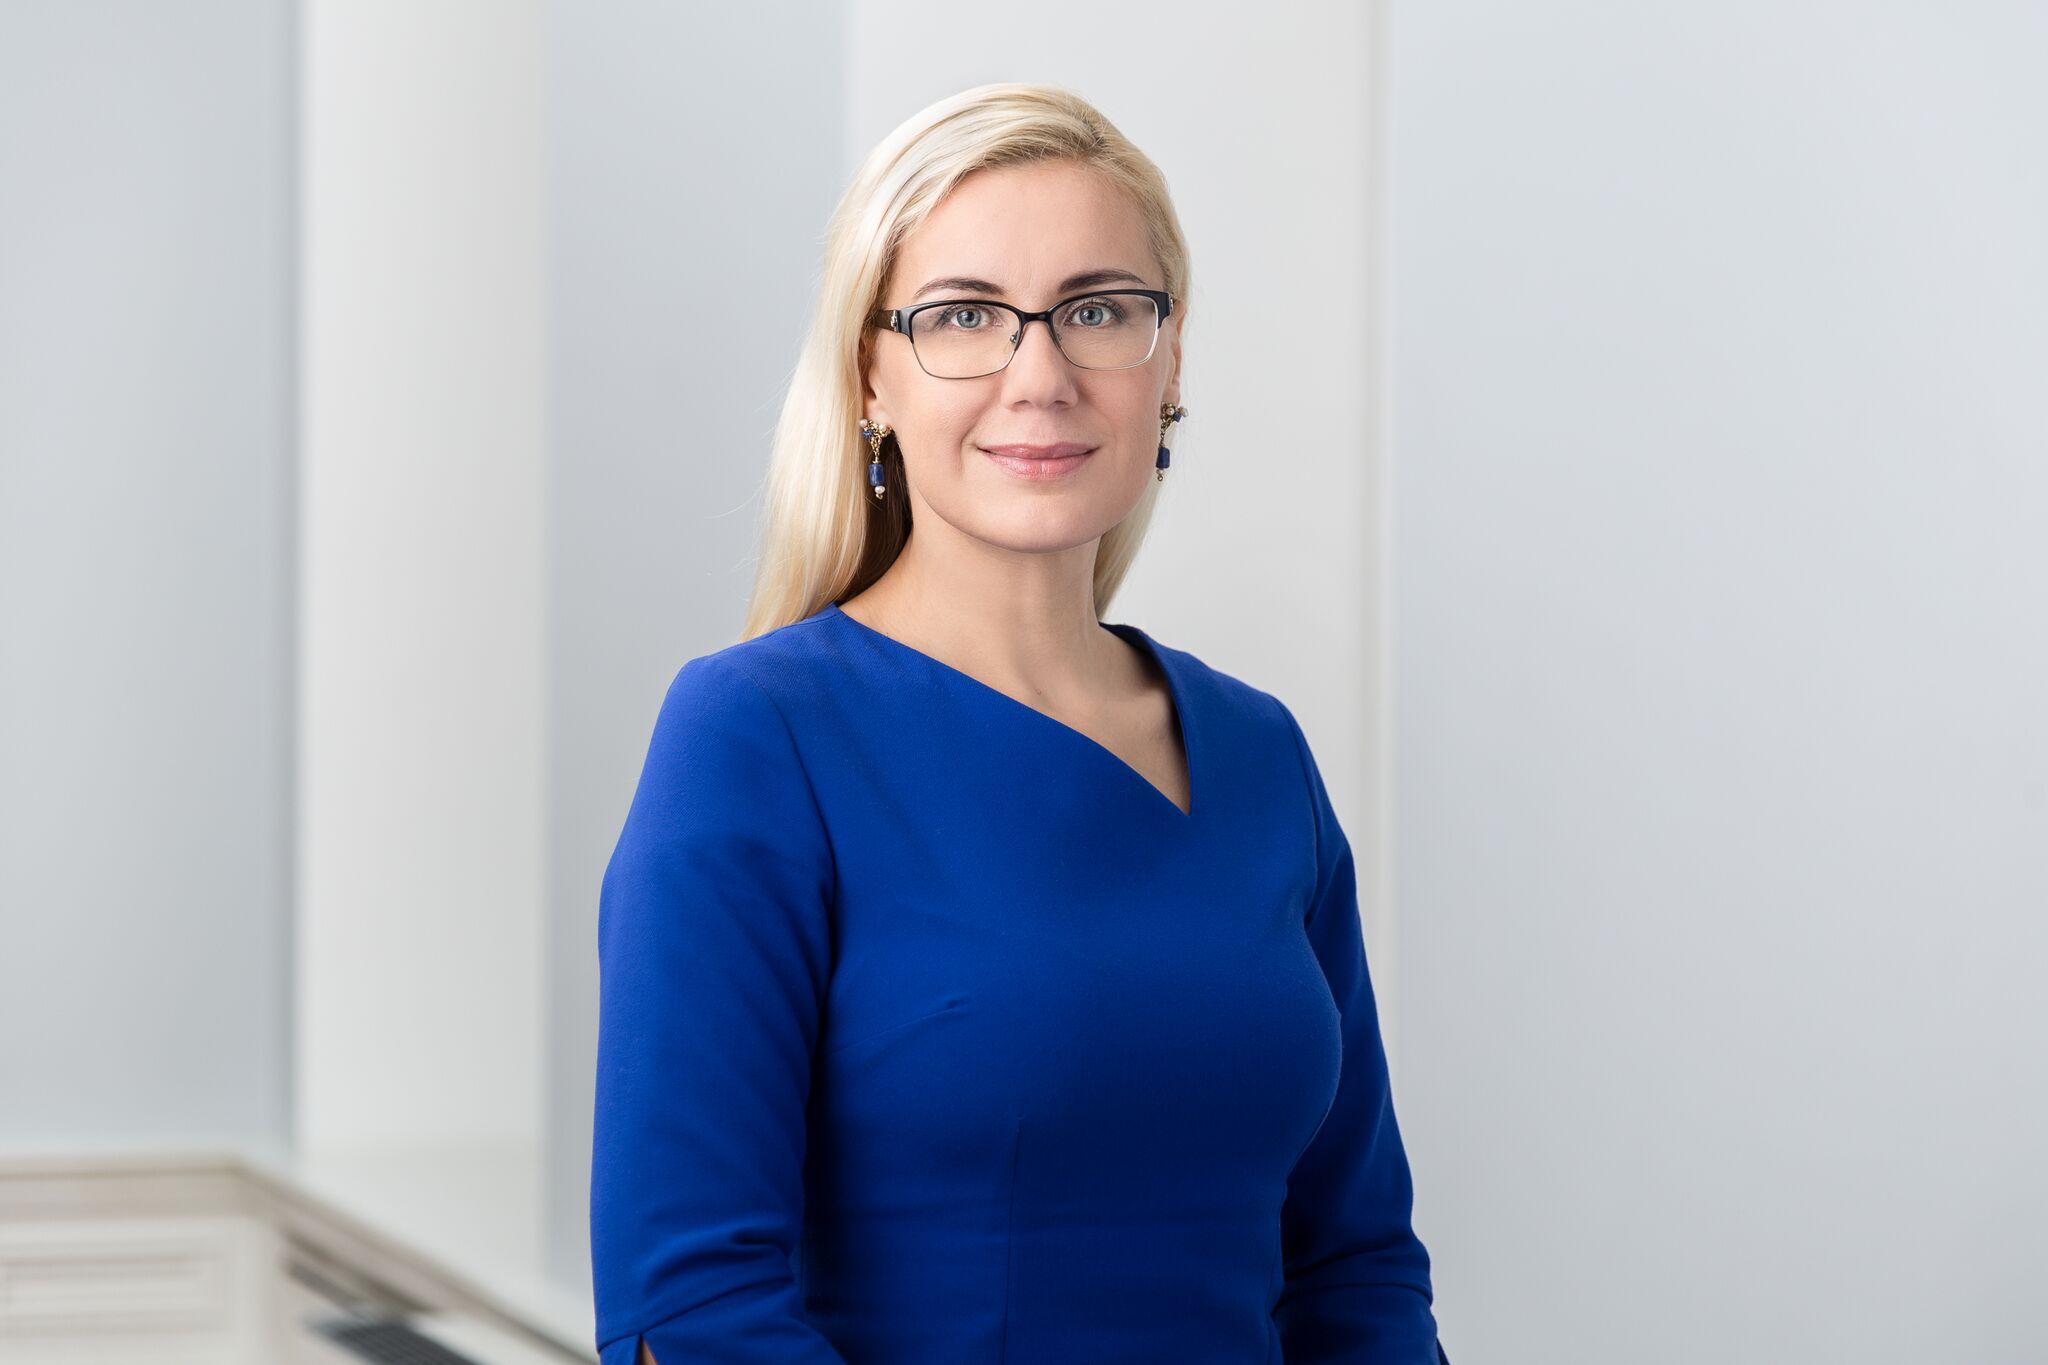 Kadri Simson je novi komesar za energetiku – Fans Timmermans imenovan je za evropskog koordinatora za European Green Deal